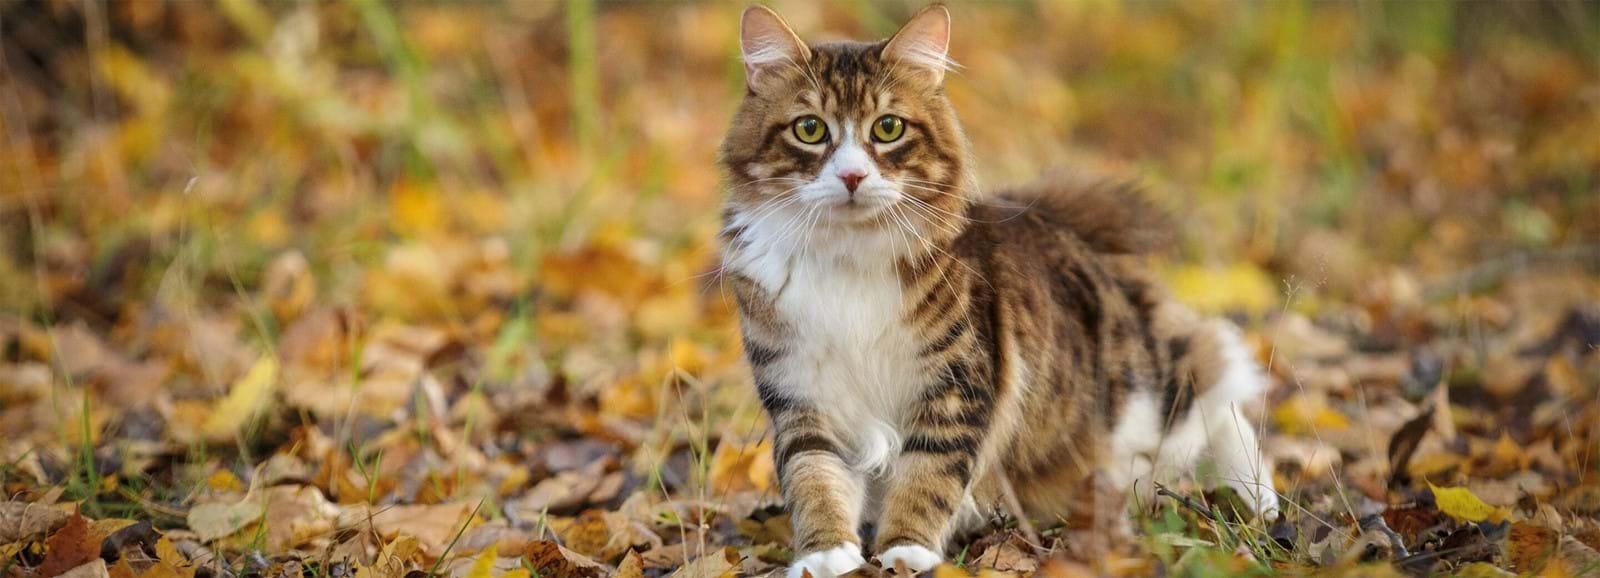 A cat's development